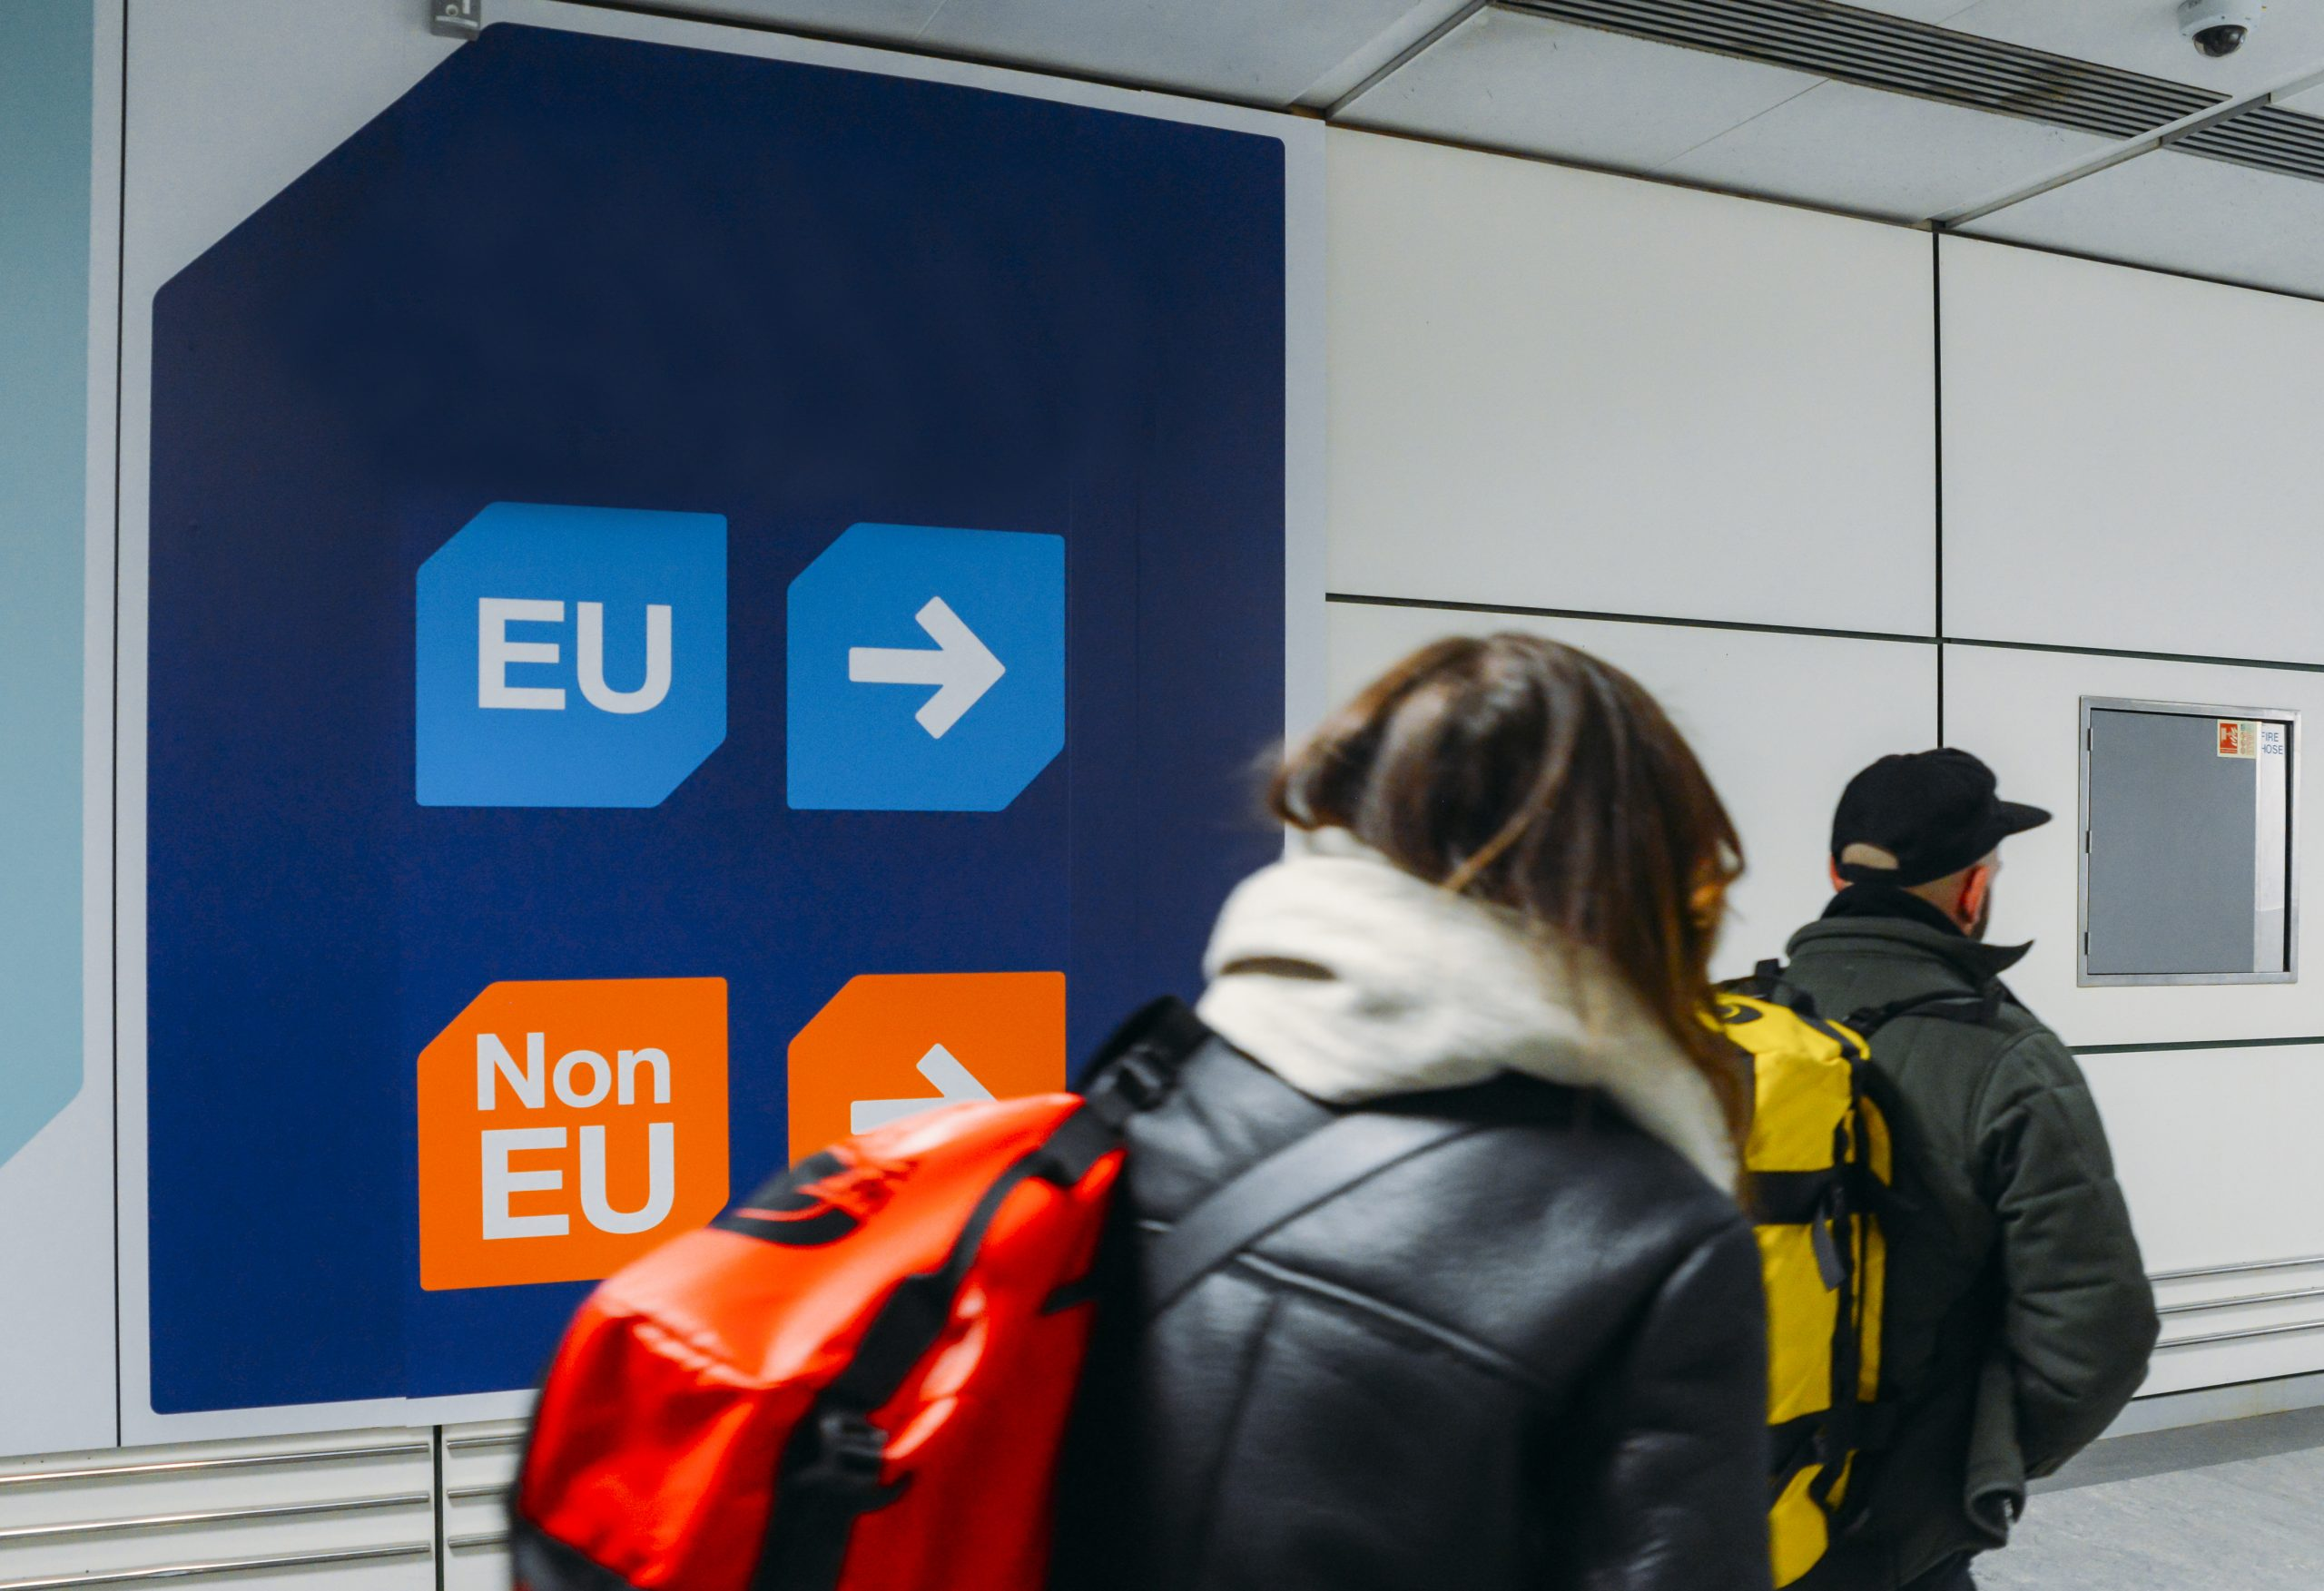 SITA steps up smart border solutions for EU Schengen Zone